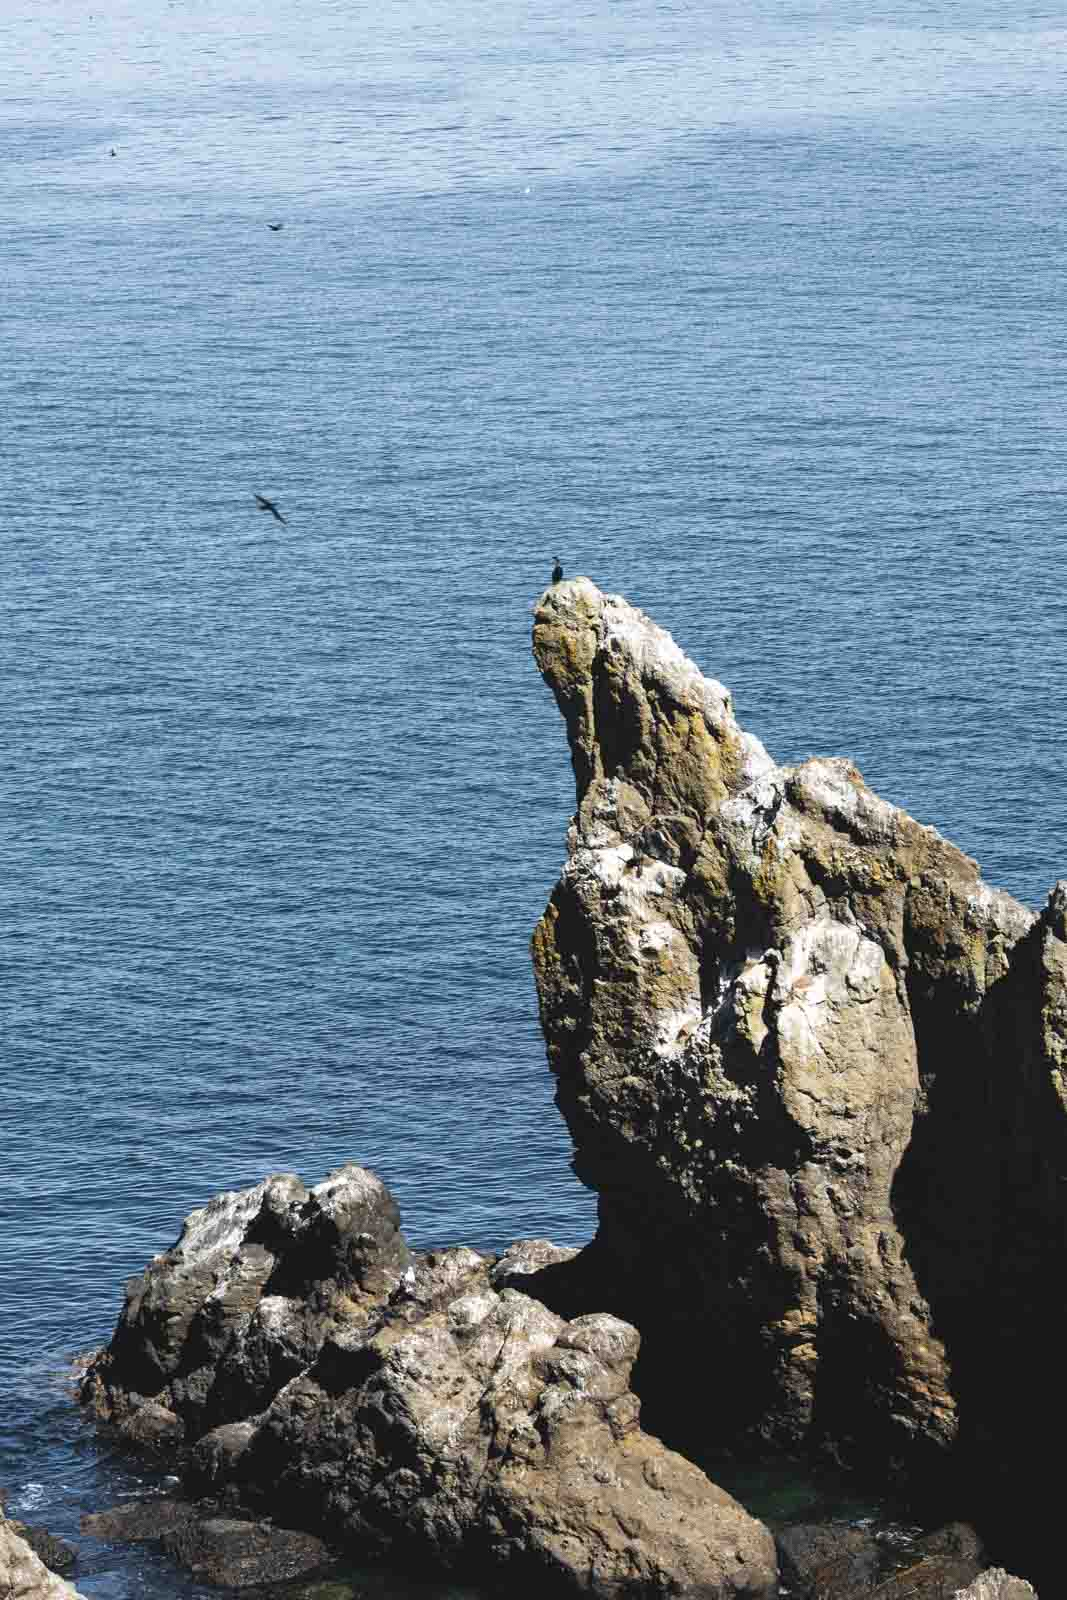 Seabirds on coastal rocks at Yaquina Head Lighthouse, one of the best Oregon Lighthouses